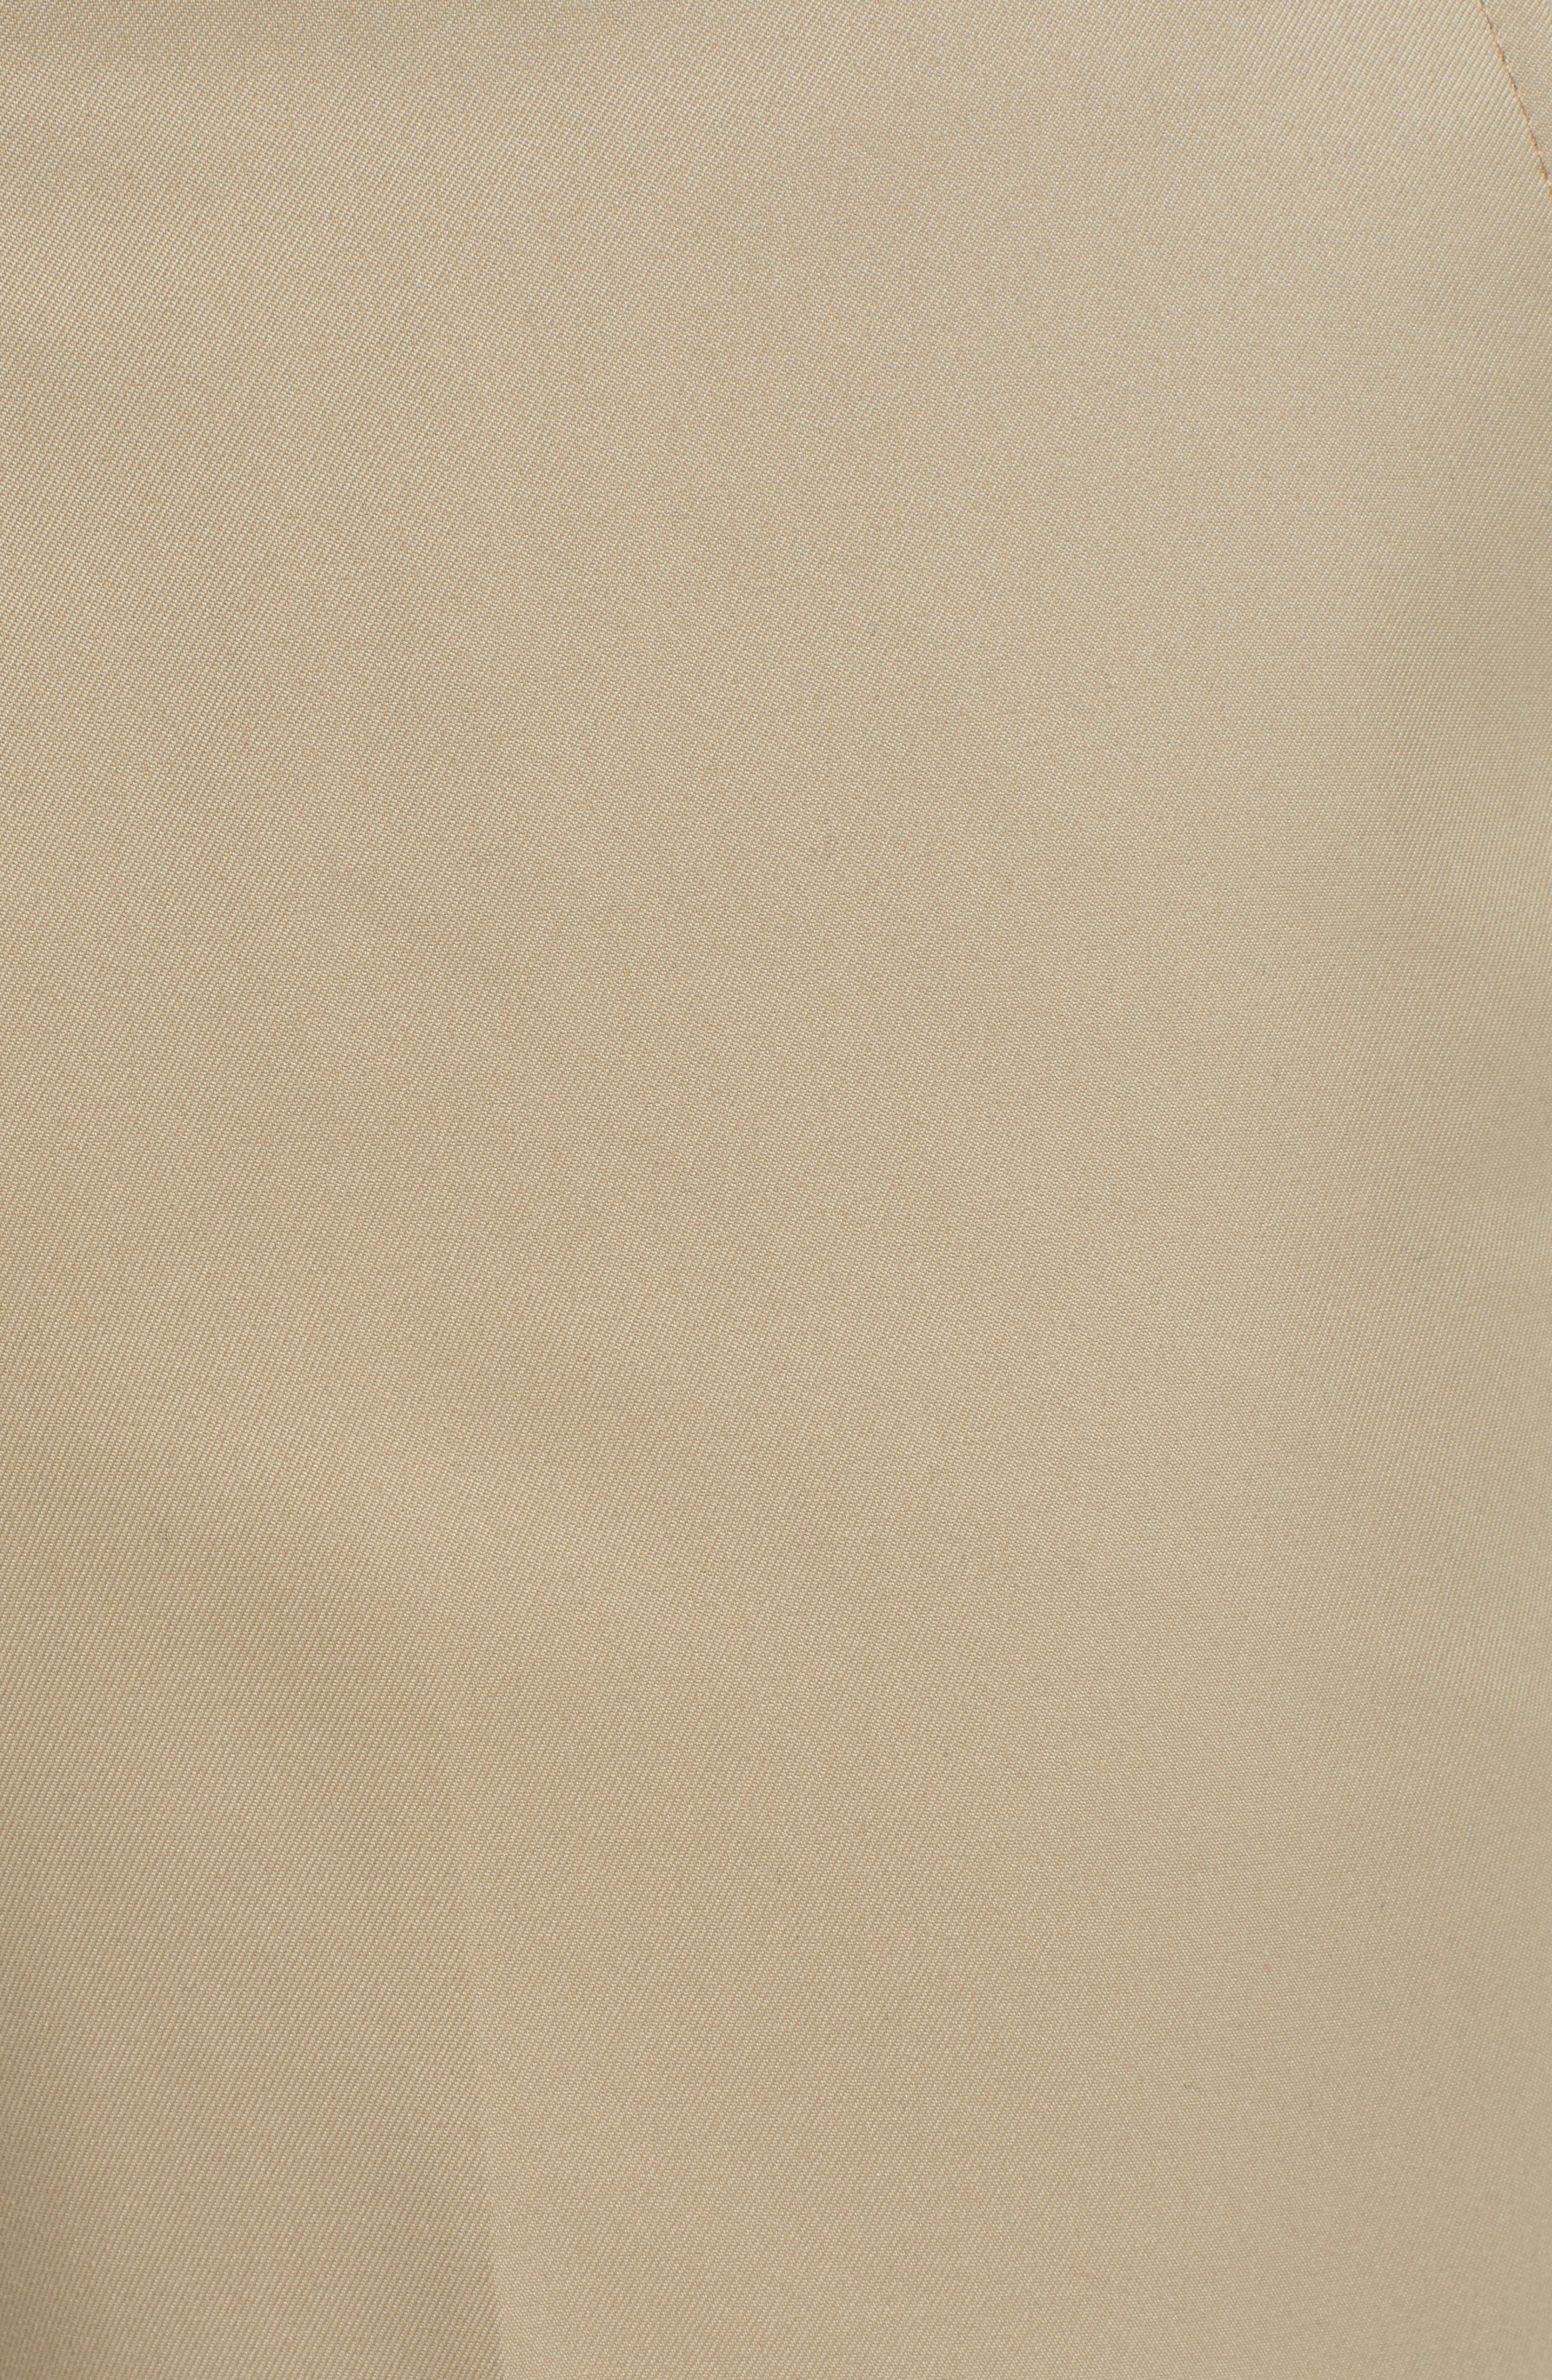 Classic Fit Flat Front Microfiber Performance Trousers,                             Alternate thumbnail 5, color,                             TAN